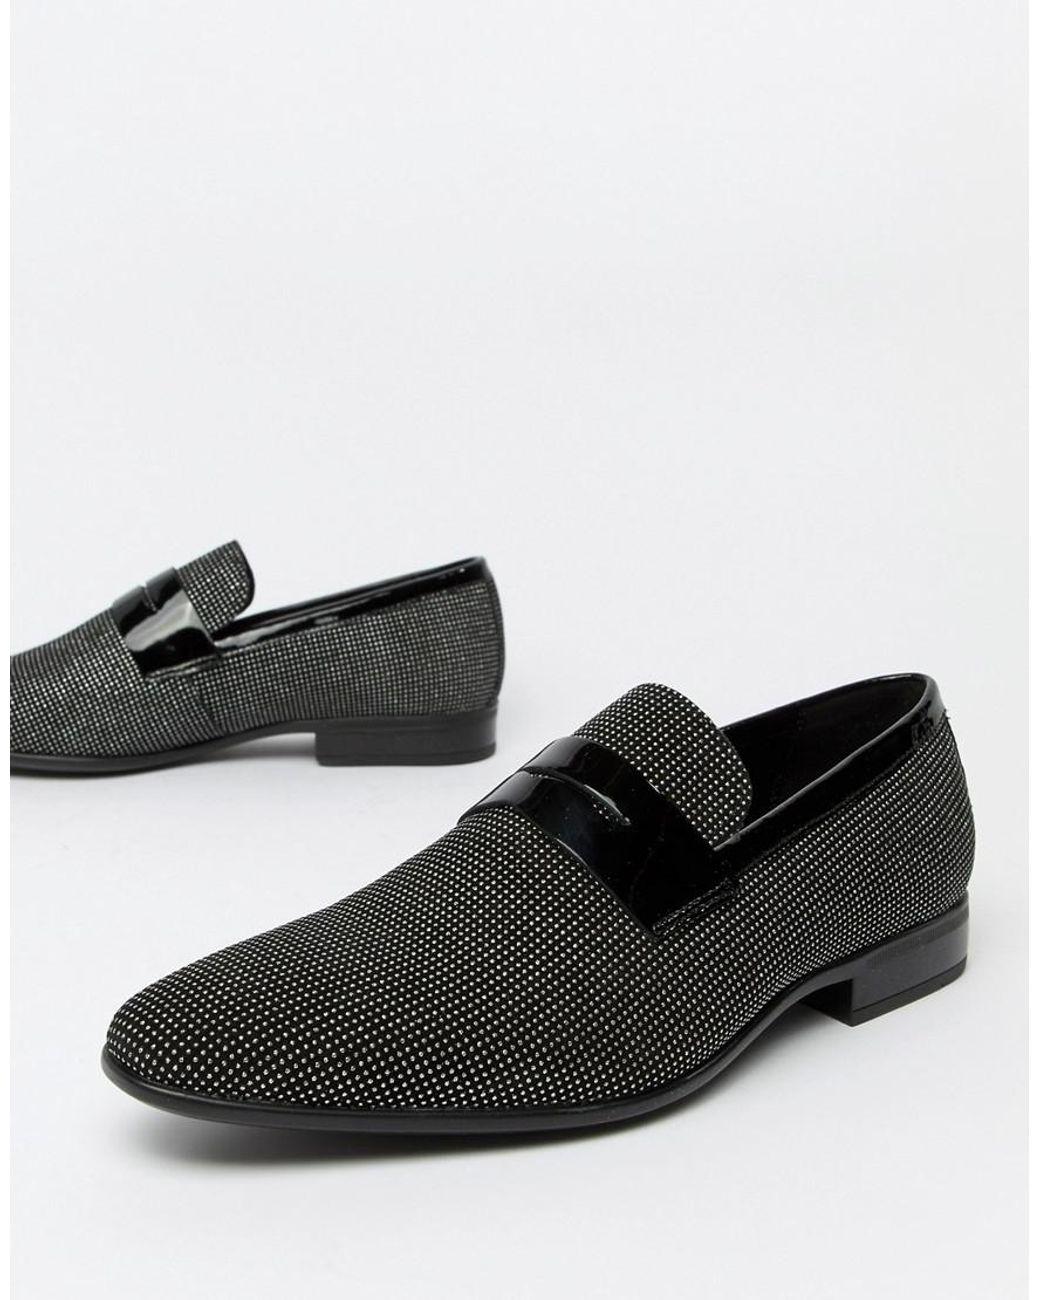 e09972d6867 ALDO Jerani Studded Loafers In Black in Black for Men - Lyst